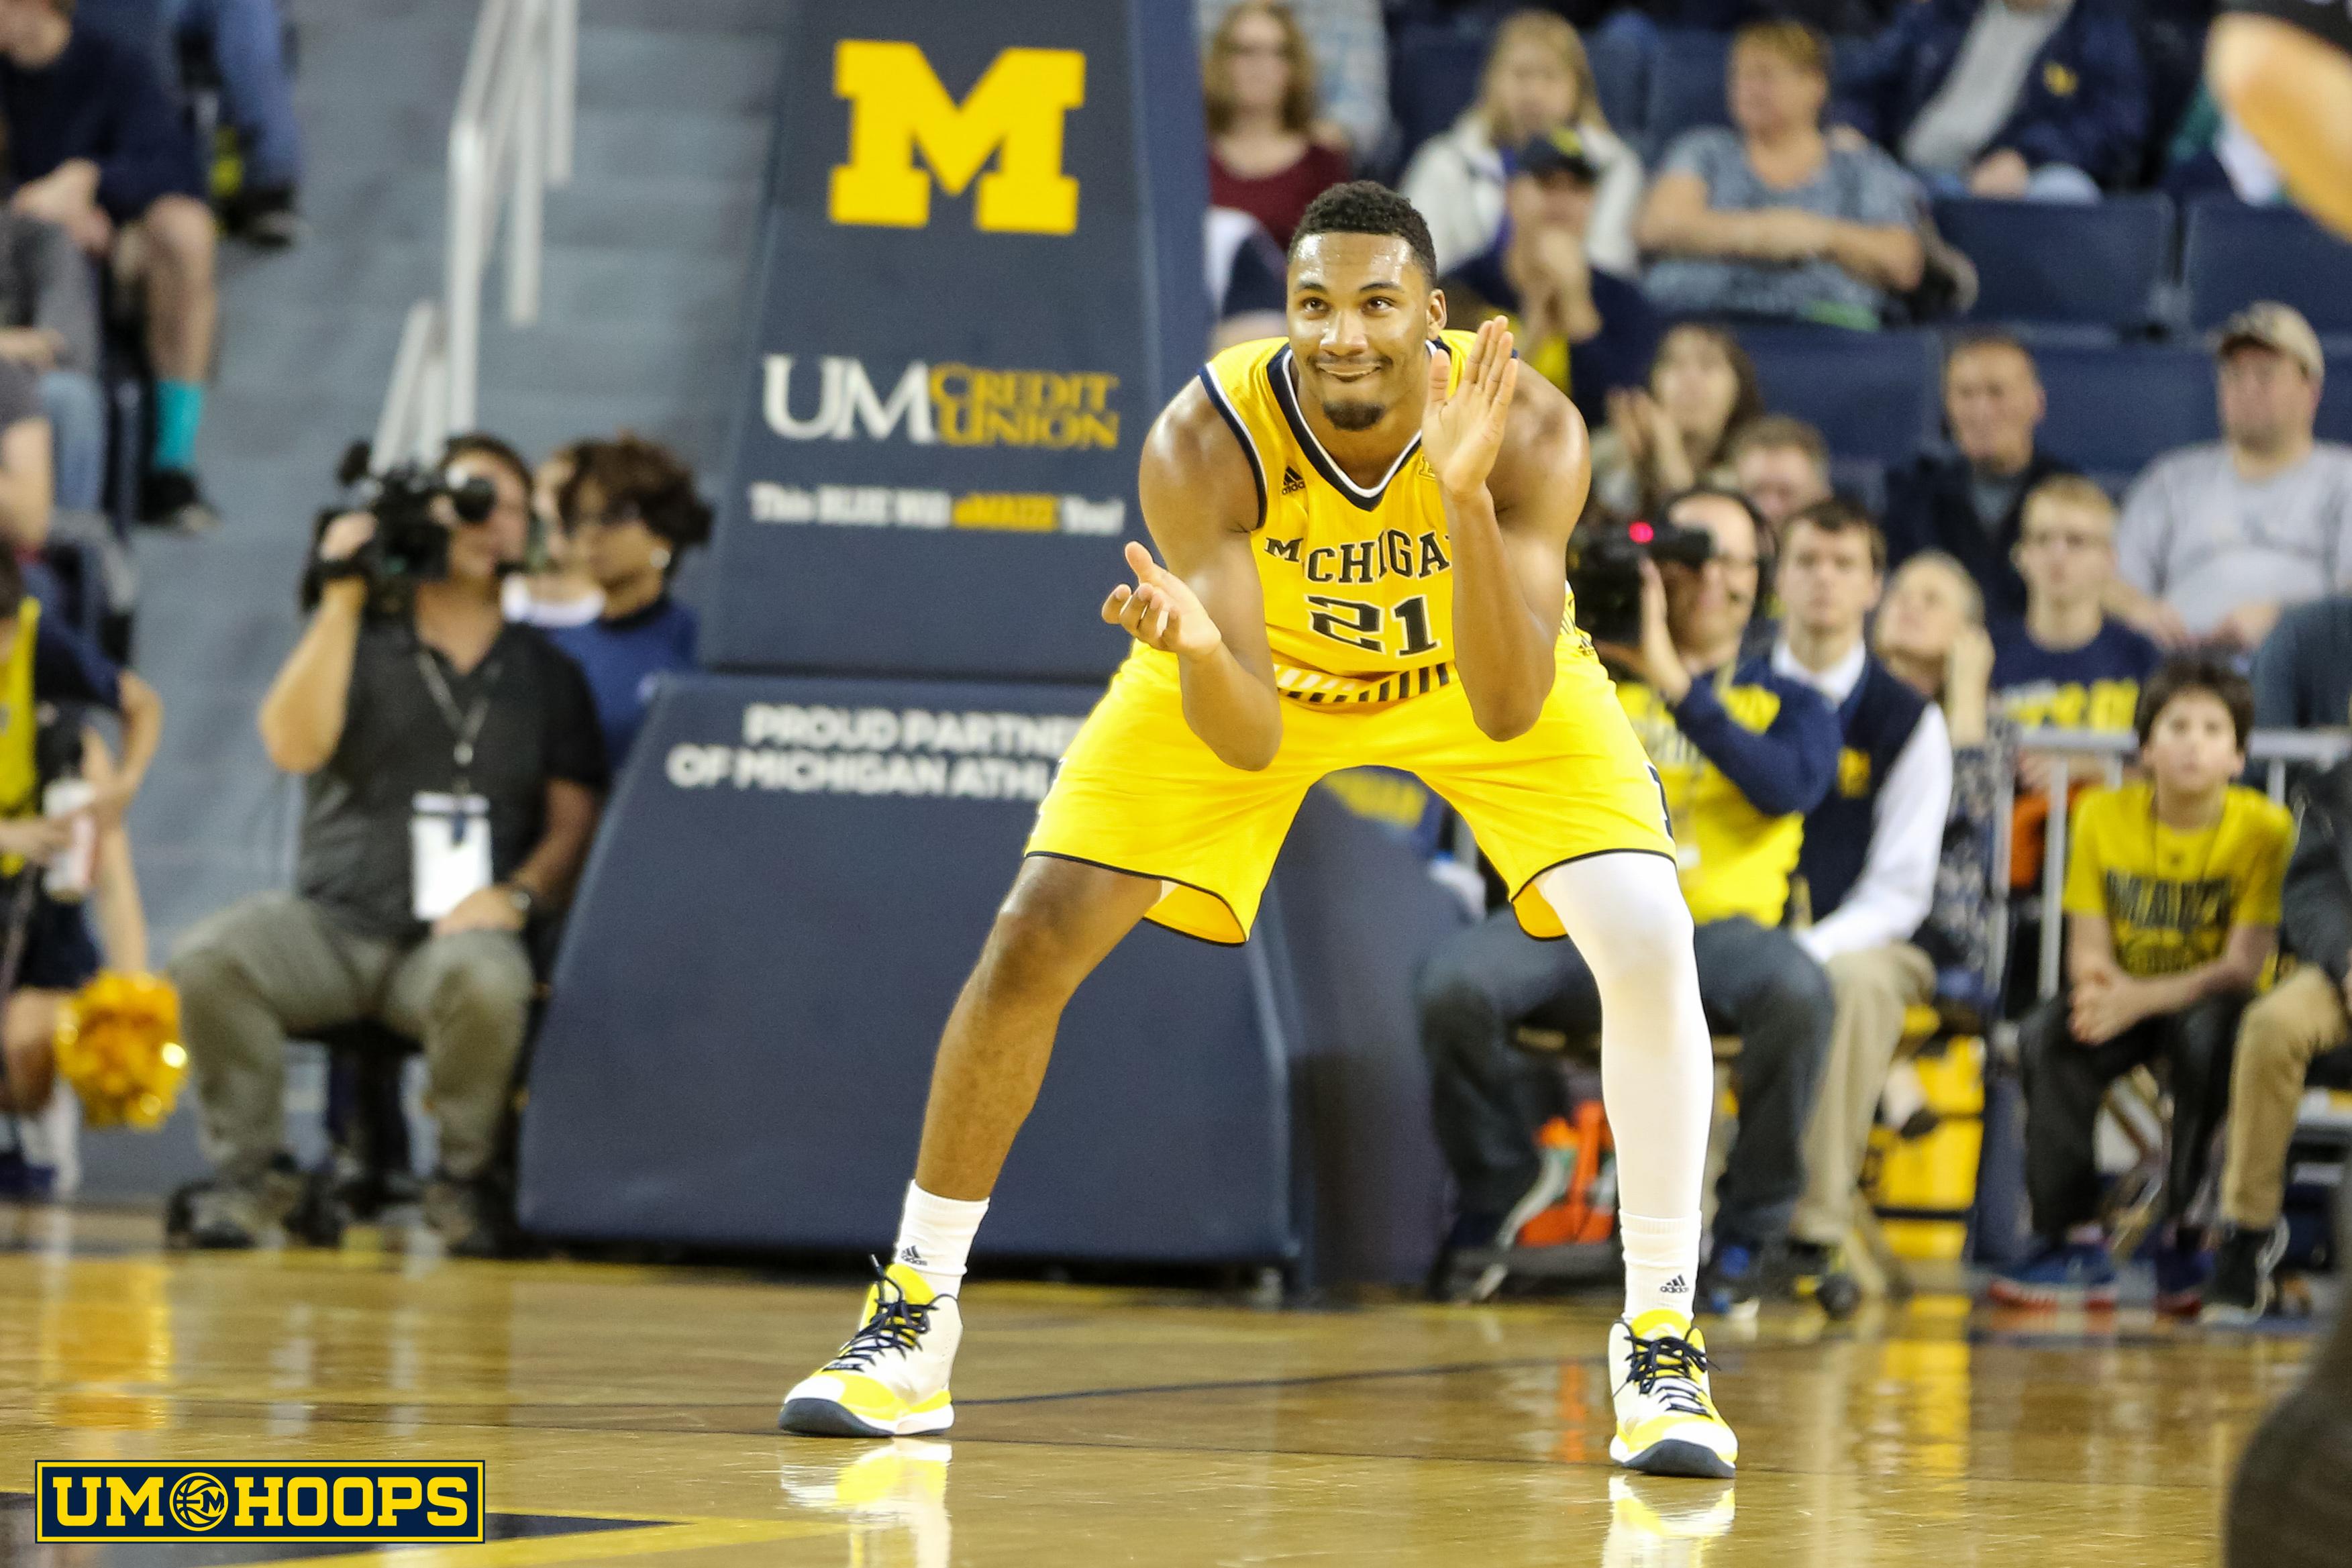 Michigan 96, Bryant 60-4